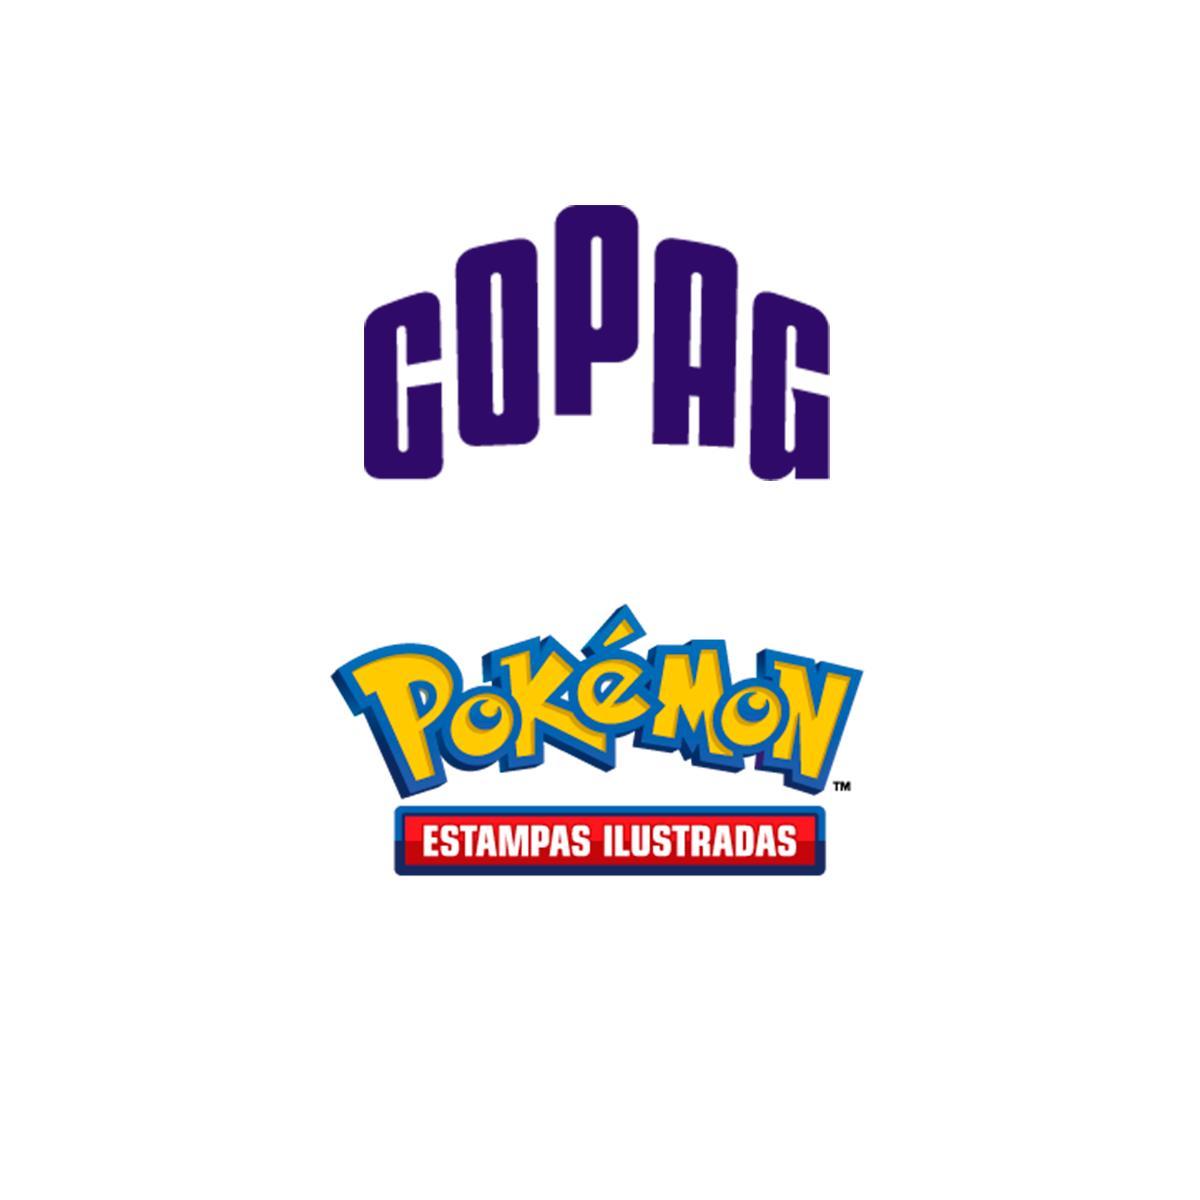 Pokémon Box Baralho Batalha De Liga Charizard Vs Pikachu